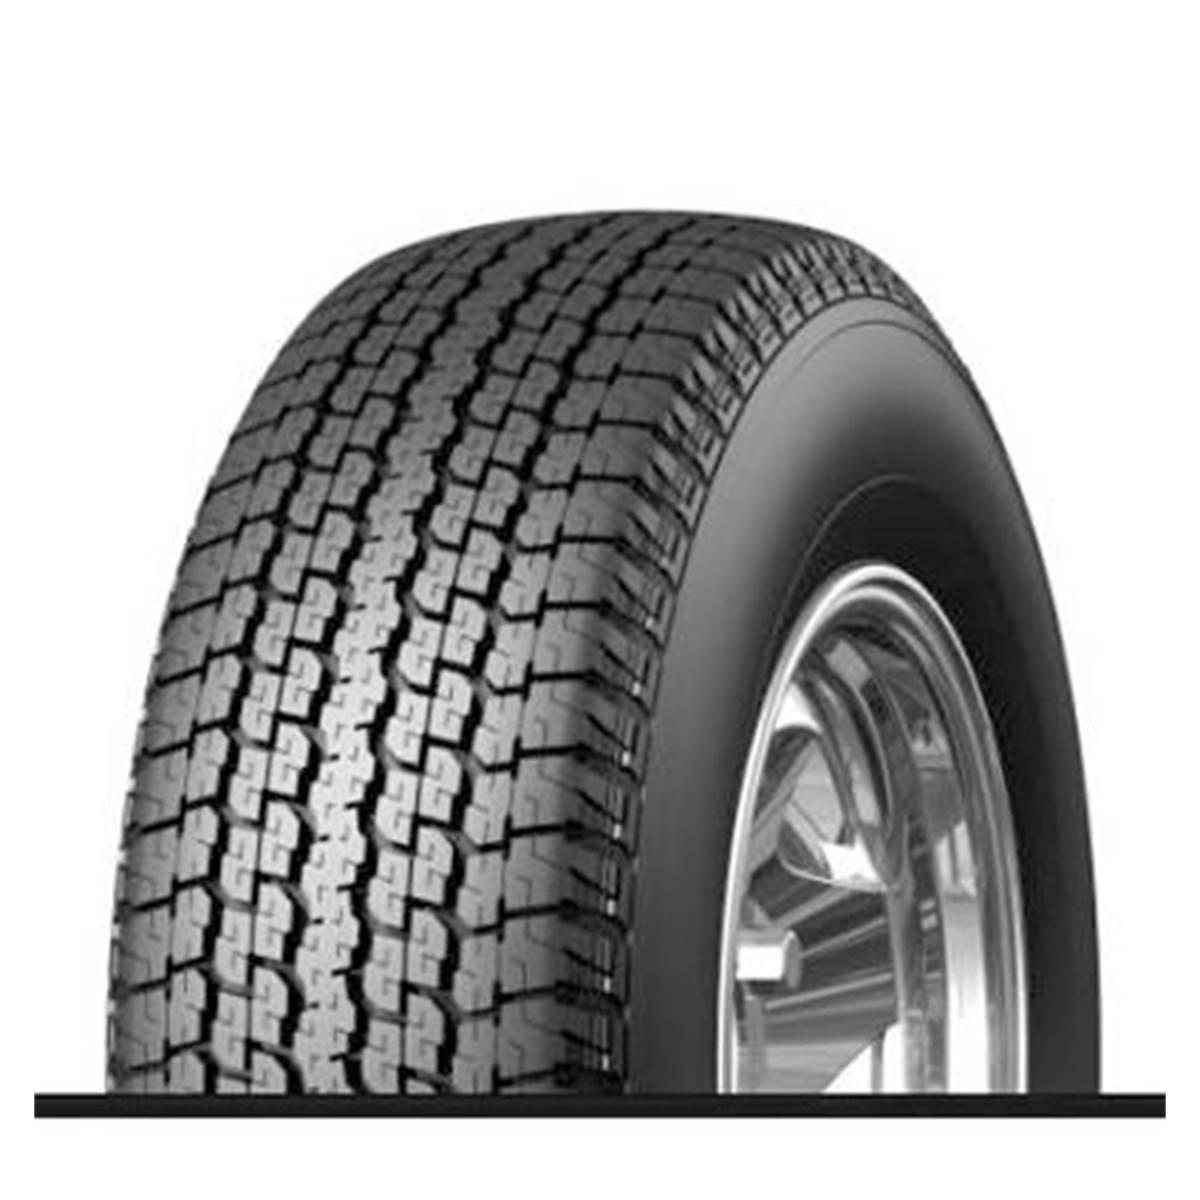 Pneu Bridgestone 255/60X17 106 T DUELER D840